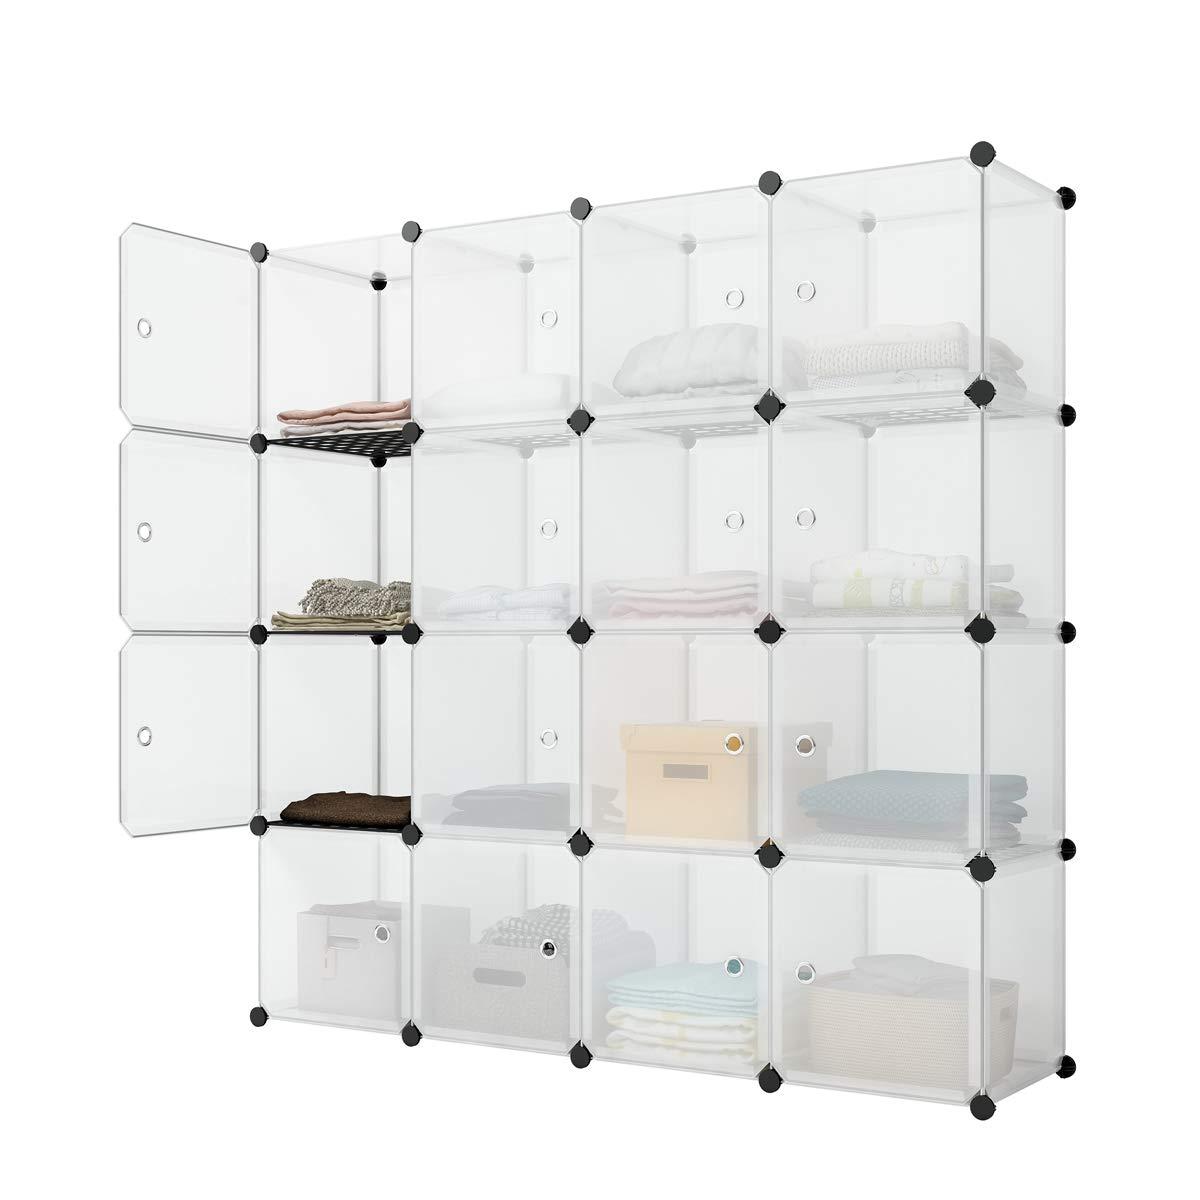 JYYG Storage Storage Shelves Storage Cubes Room Organizer Clothes Storage Storage Shelves Apartment Storage Cubby Shelving Cube Storage Dresser Shelf, Transparent White, 16 Cubes Storage by JYYG